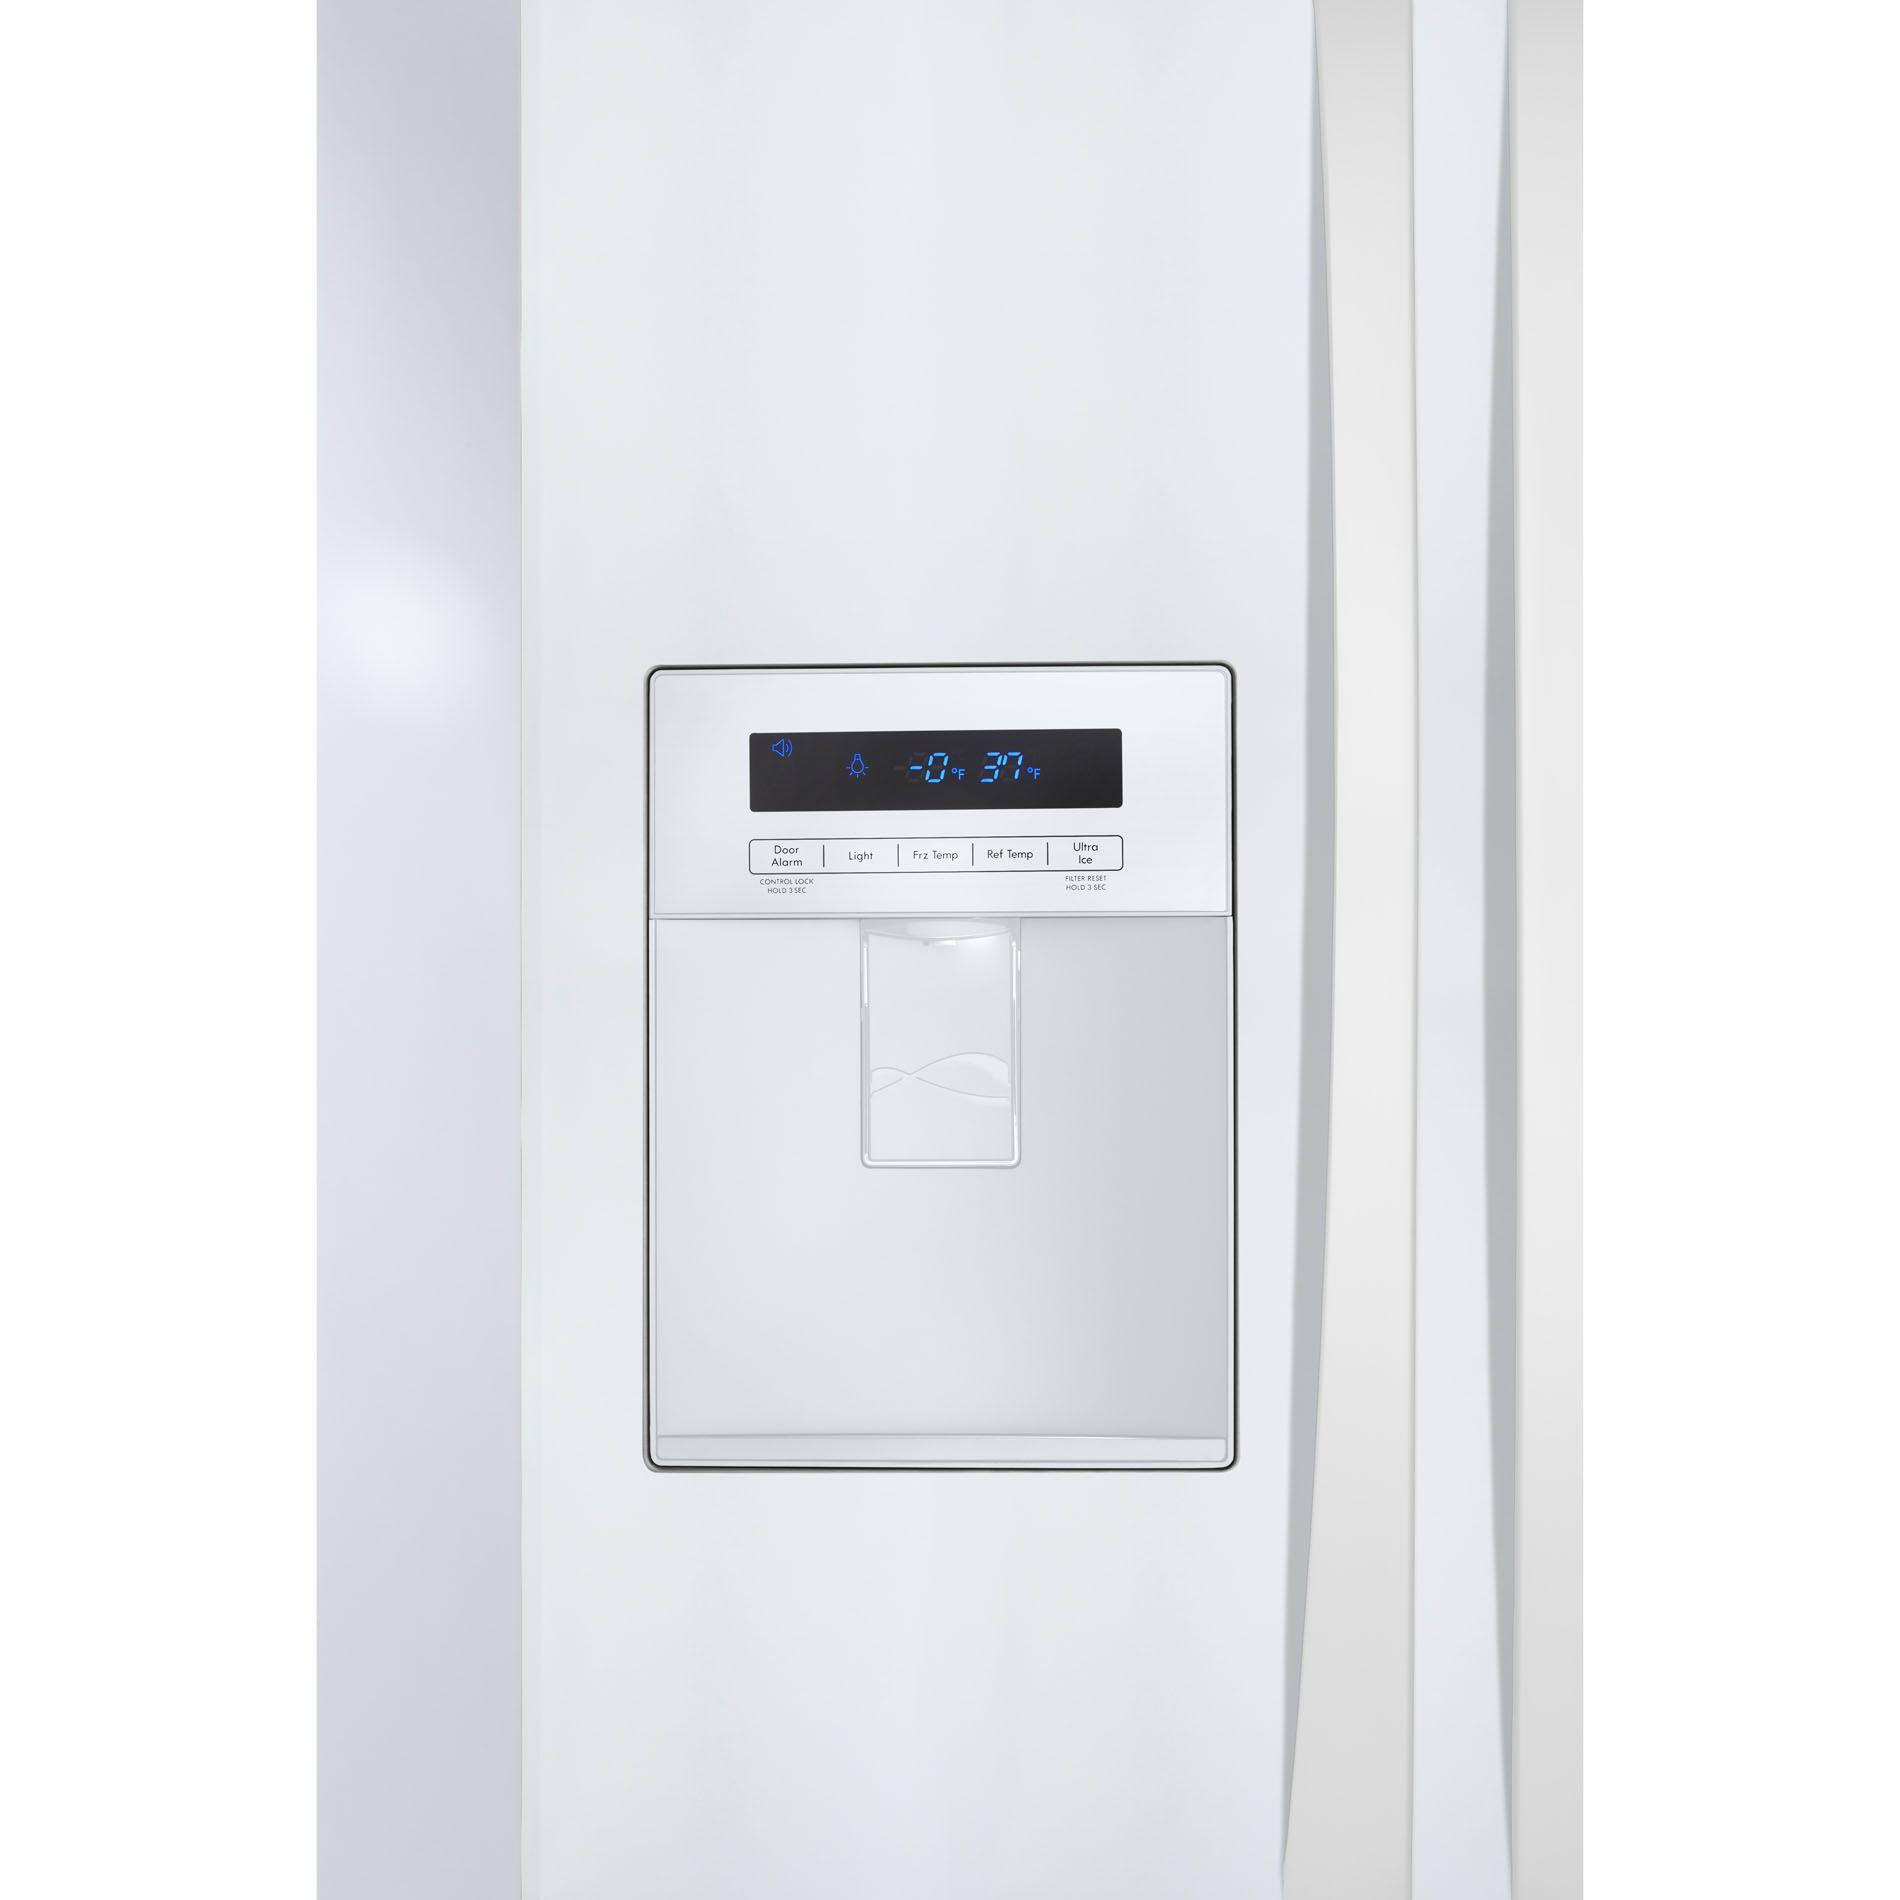 Kenmore Elite 20 cu. ft. French-Door Bottom-Freezer Refrigerator - White